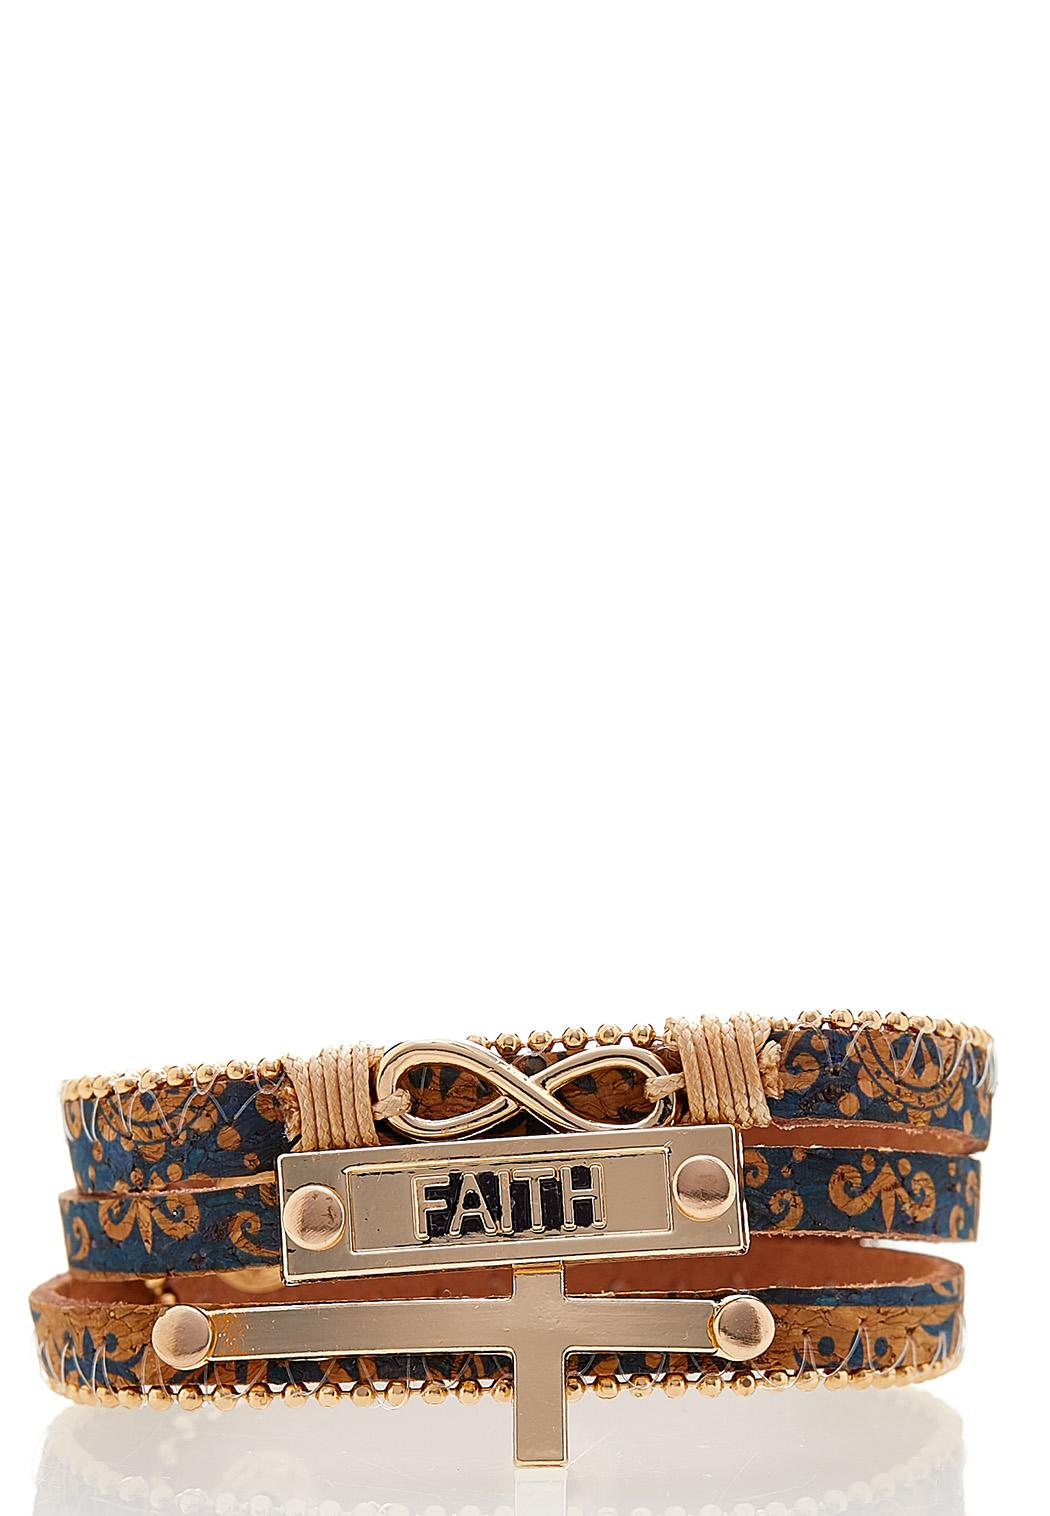 Inspirational Wrap Bracelet